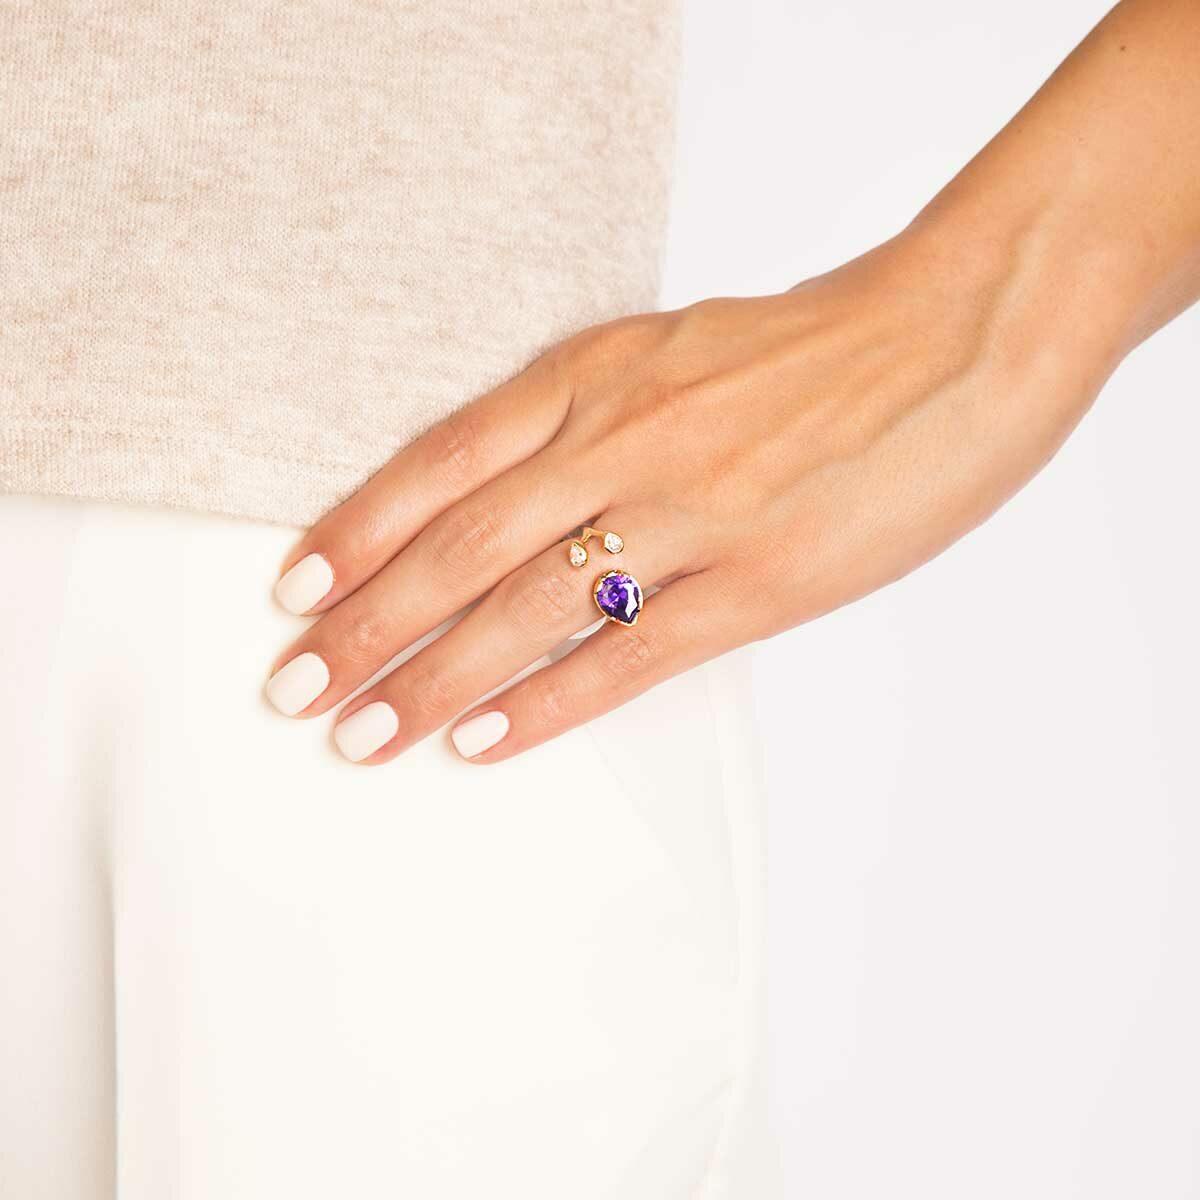 انگشتر طلا آنیتا پرسته